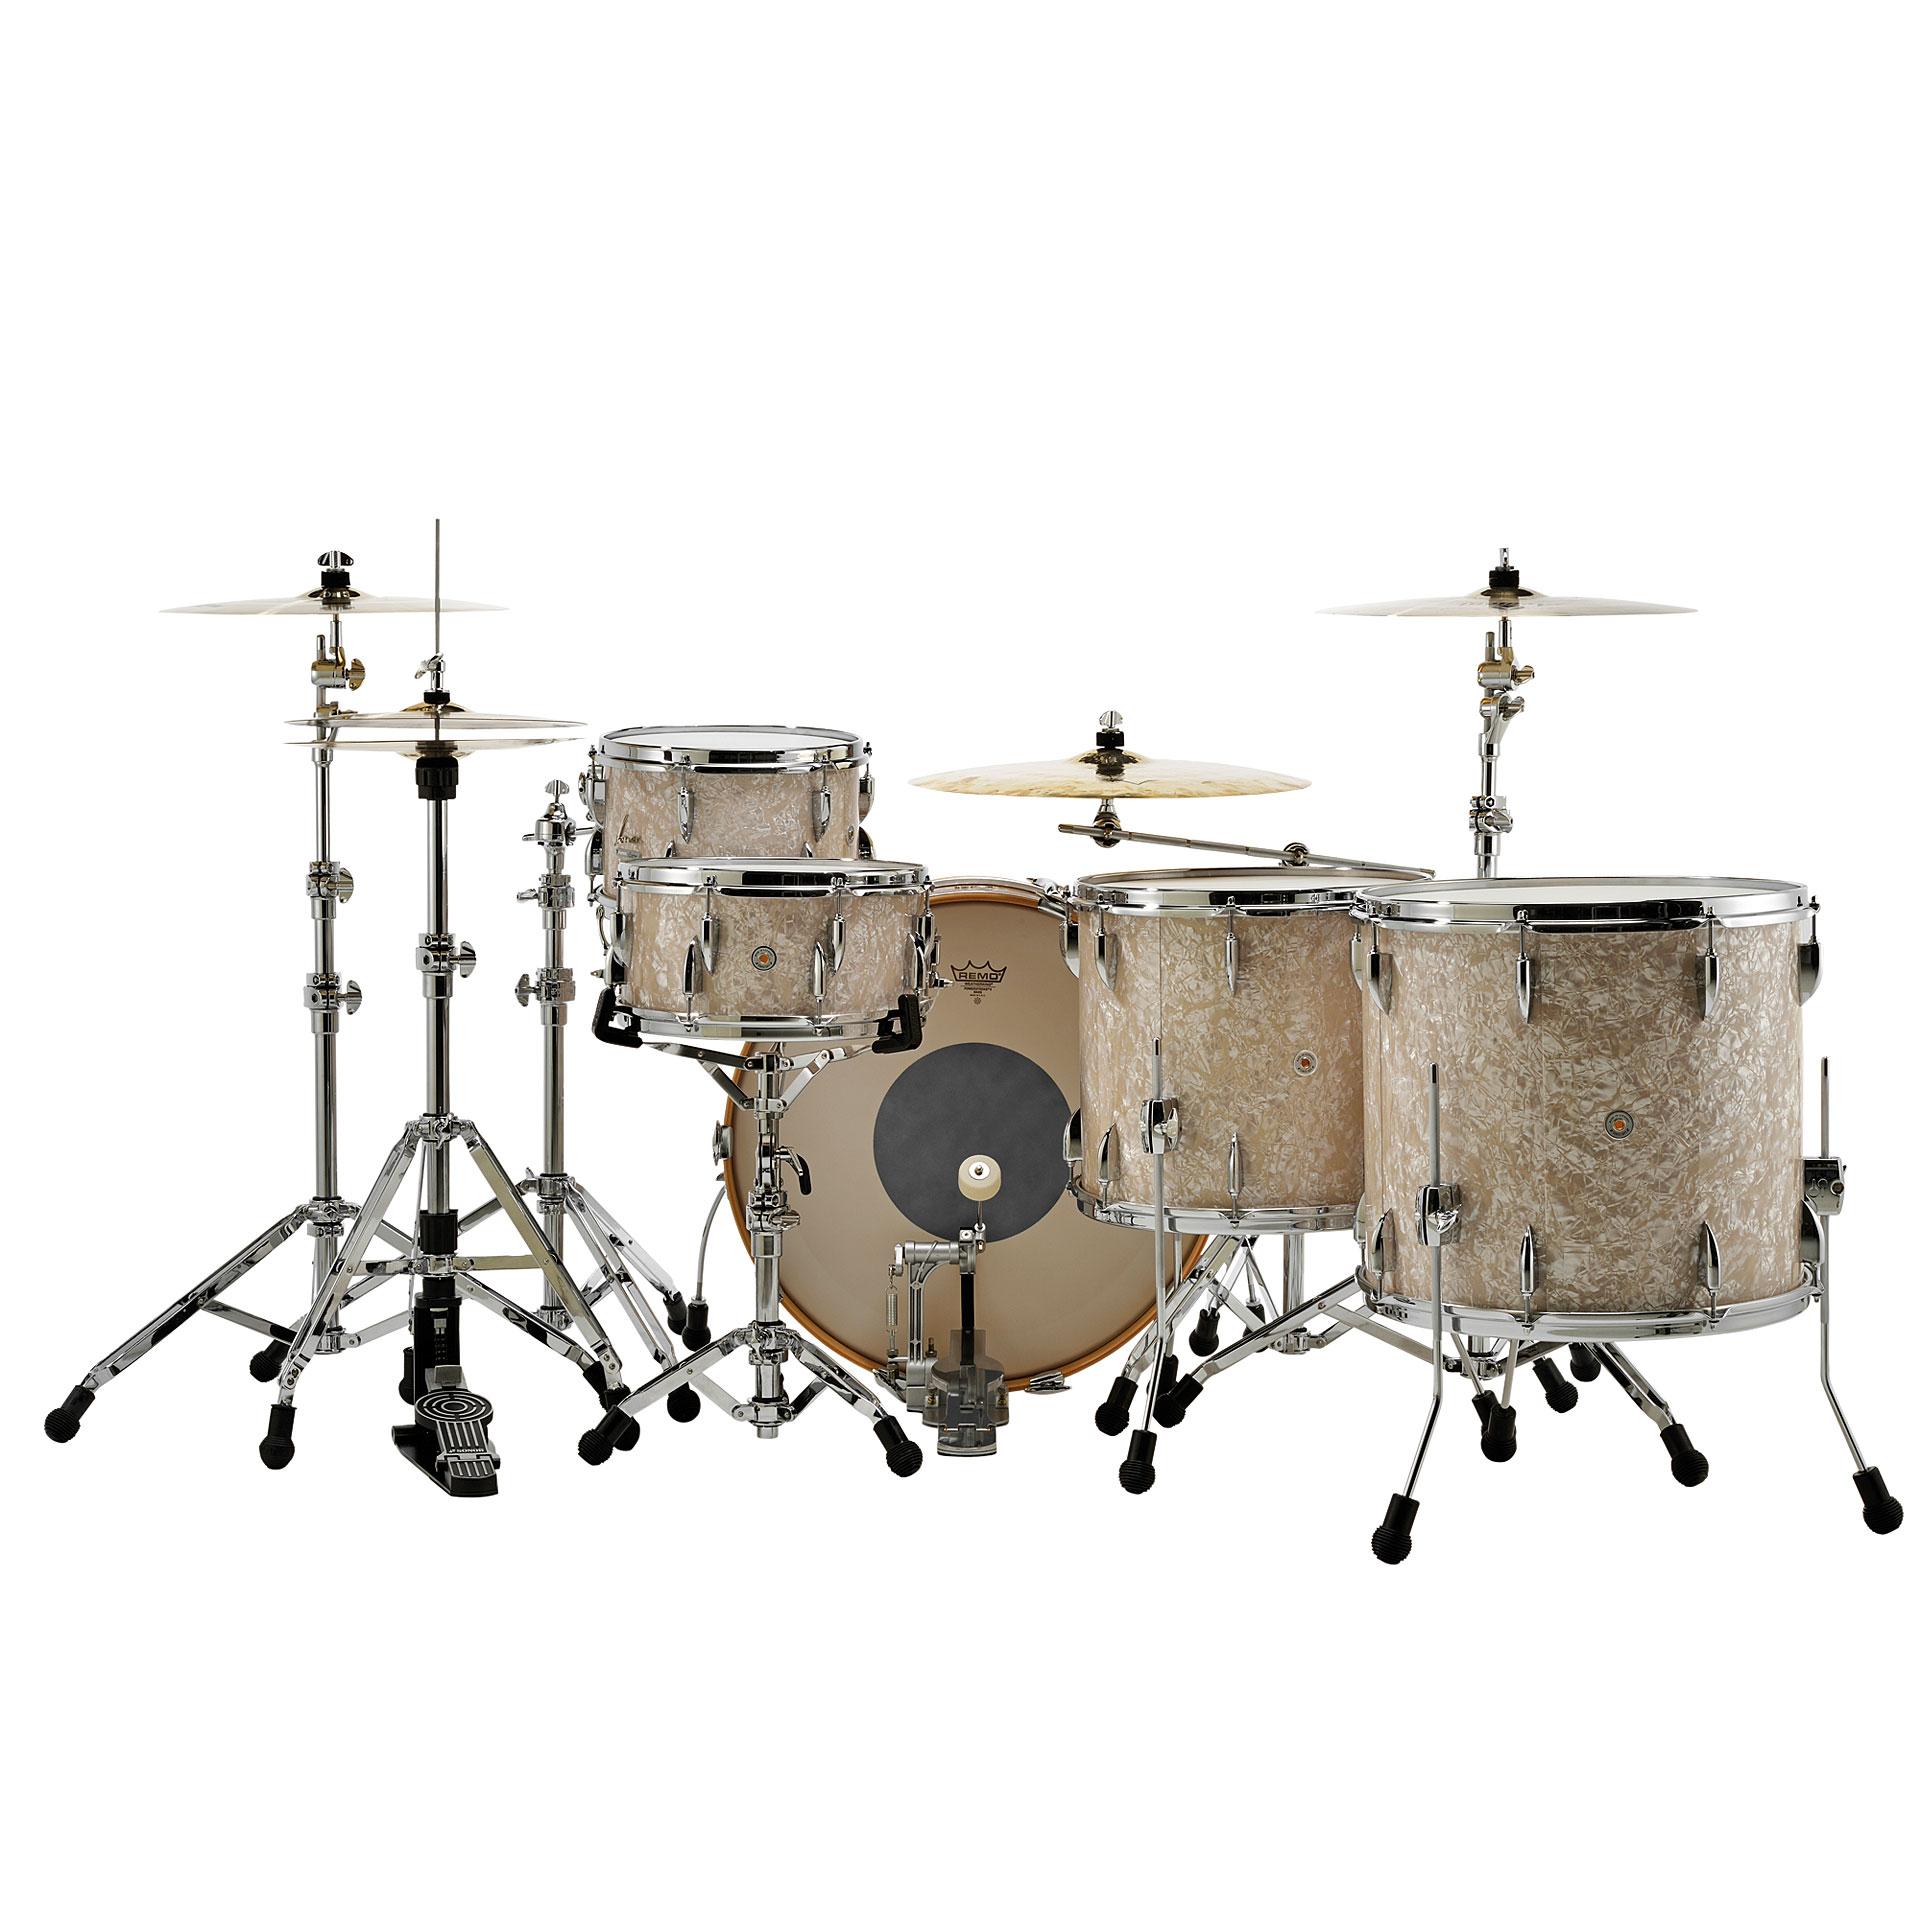 Sonor vintage series vt15 rock vintage pearl drum kit for Classic house drums